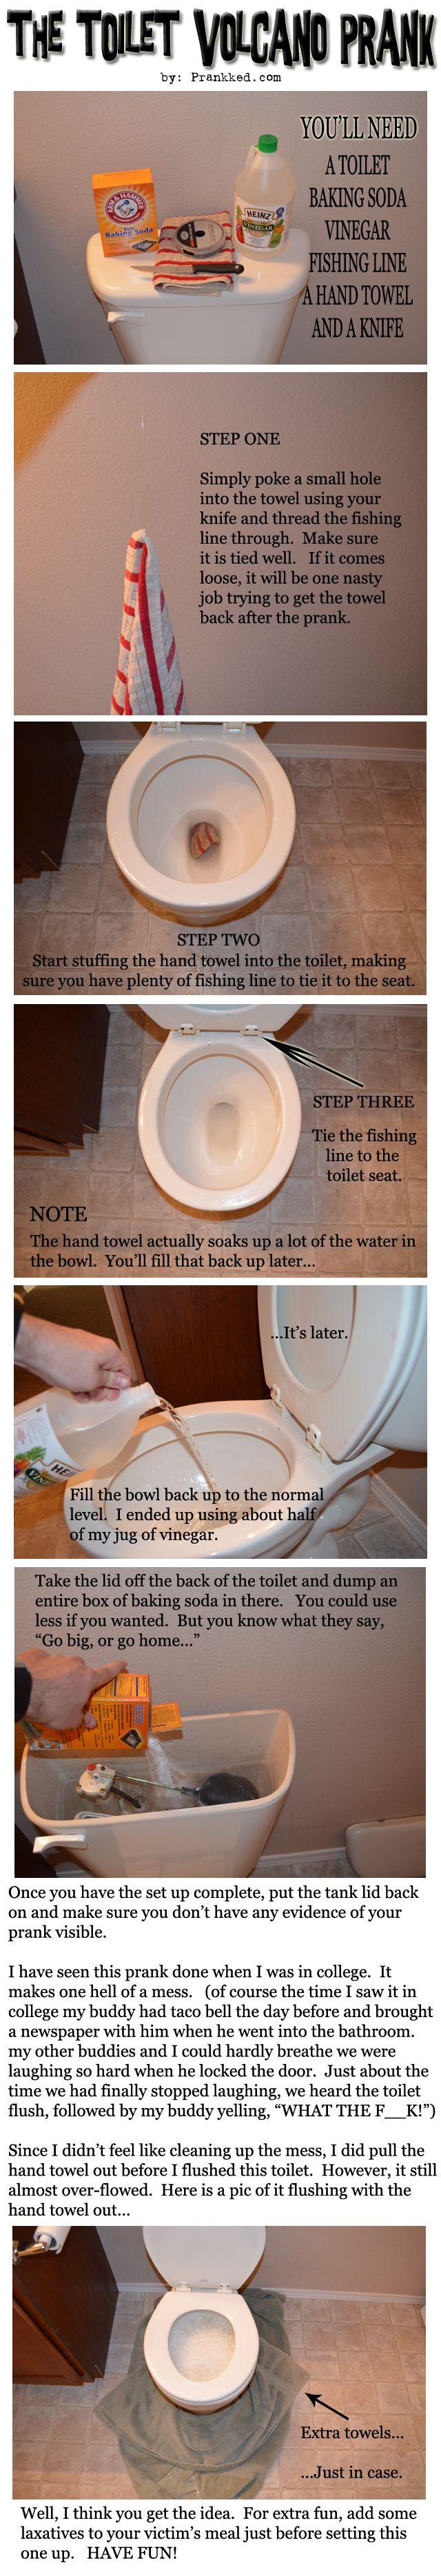 April Fools Day – Toilet Volcano Prank